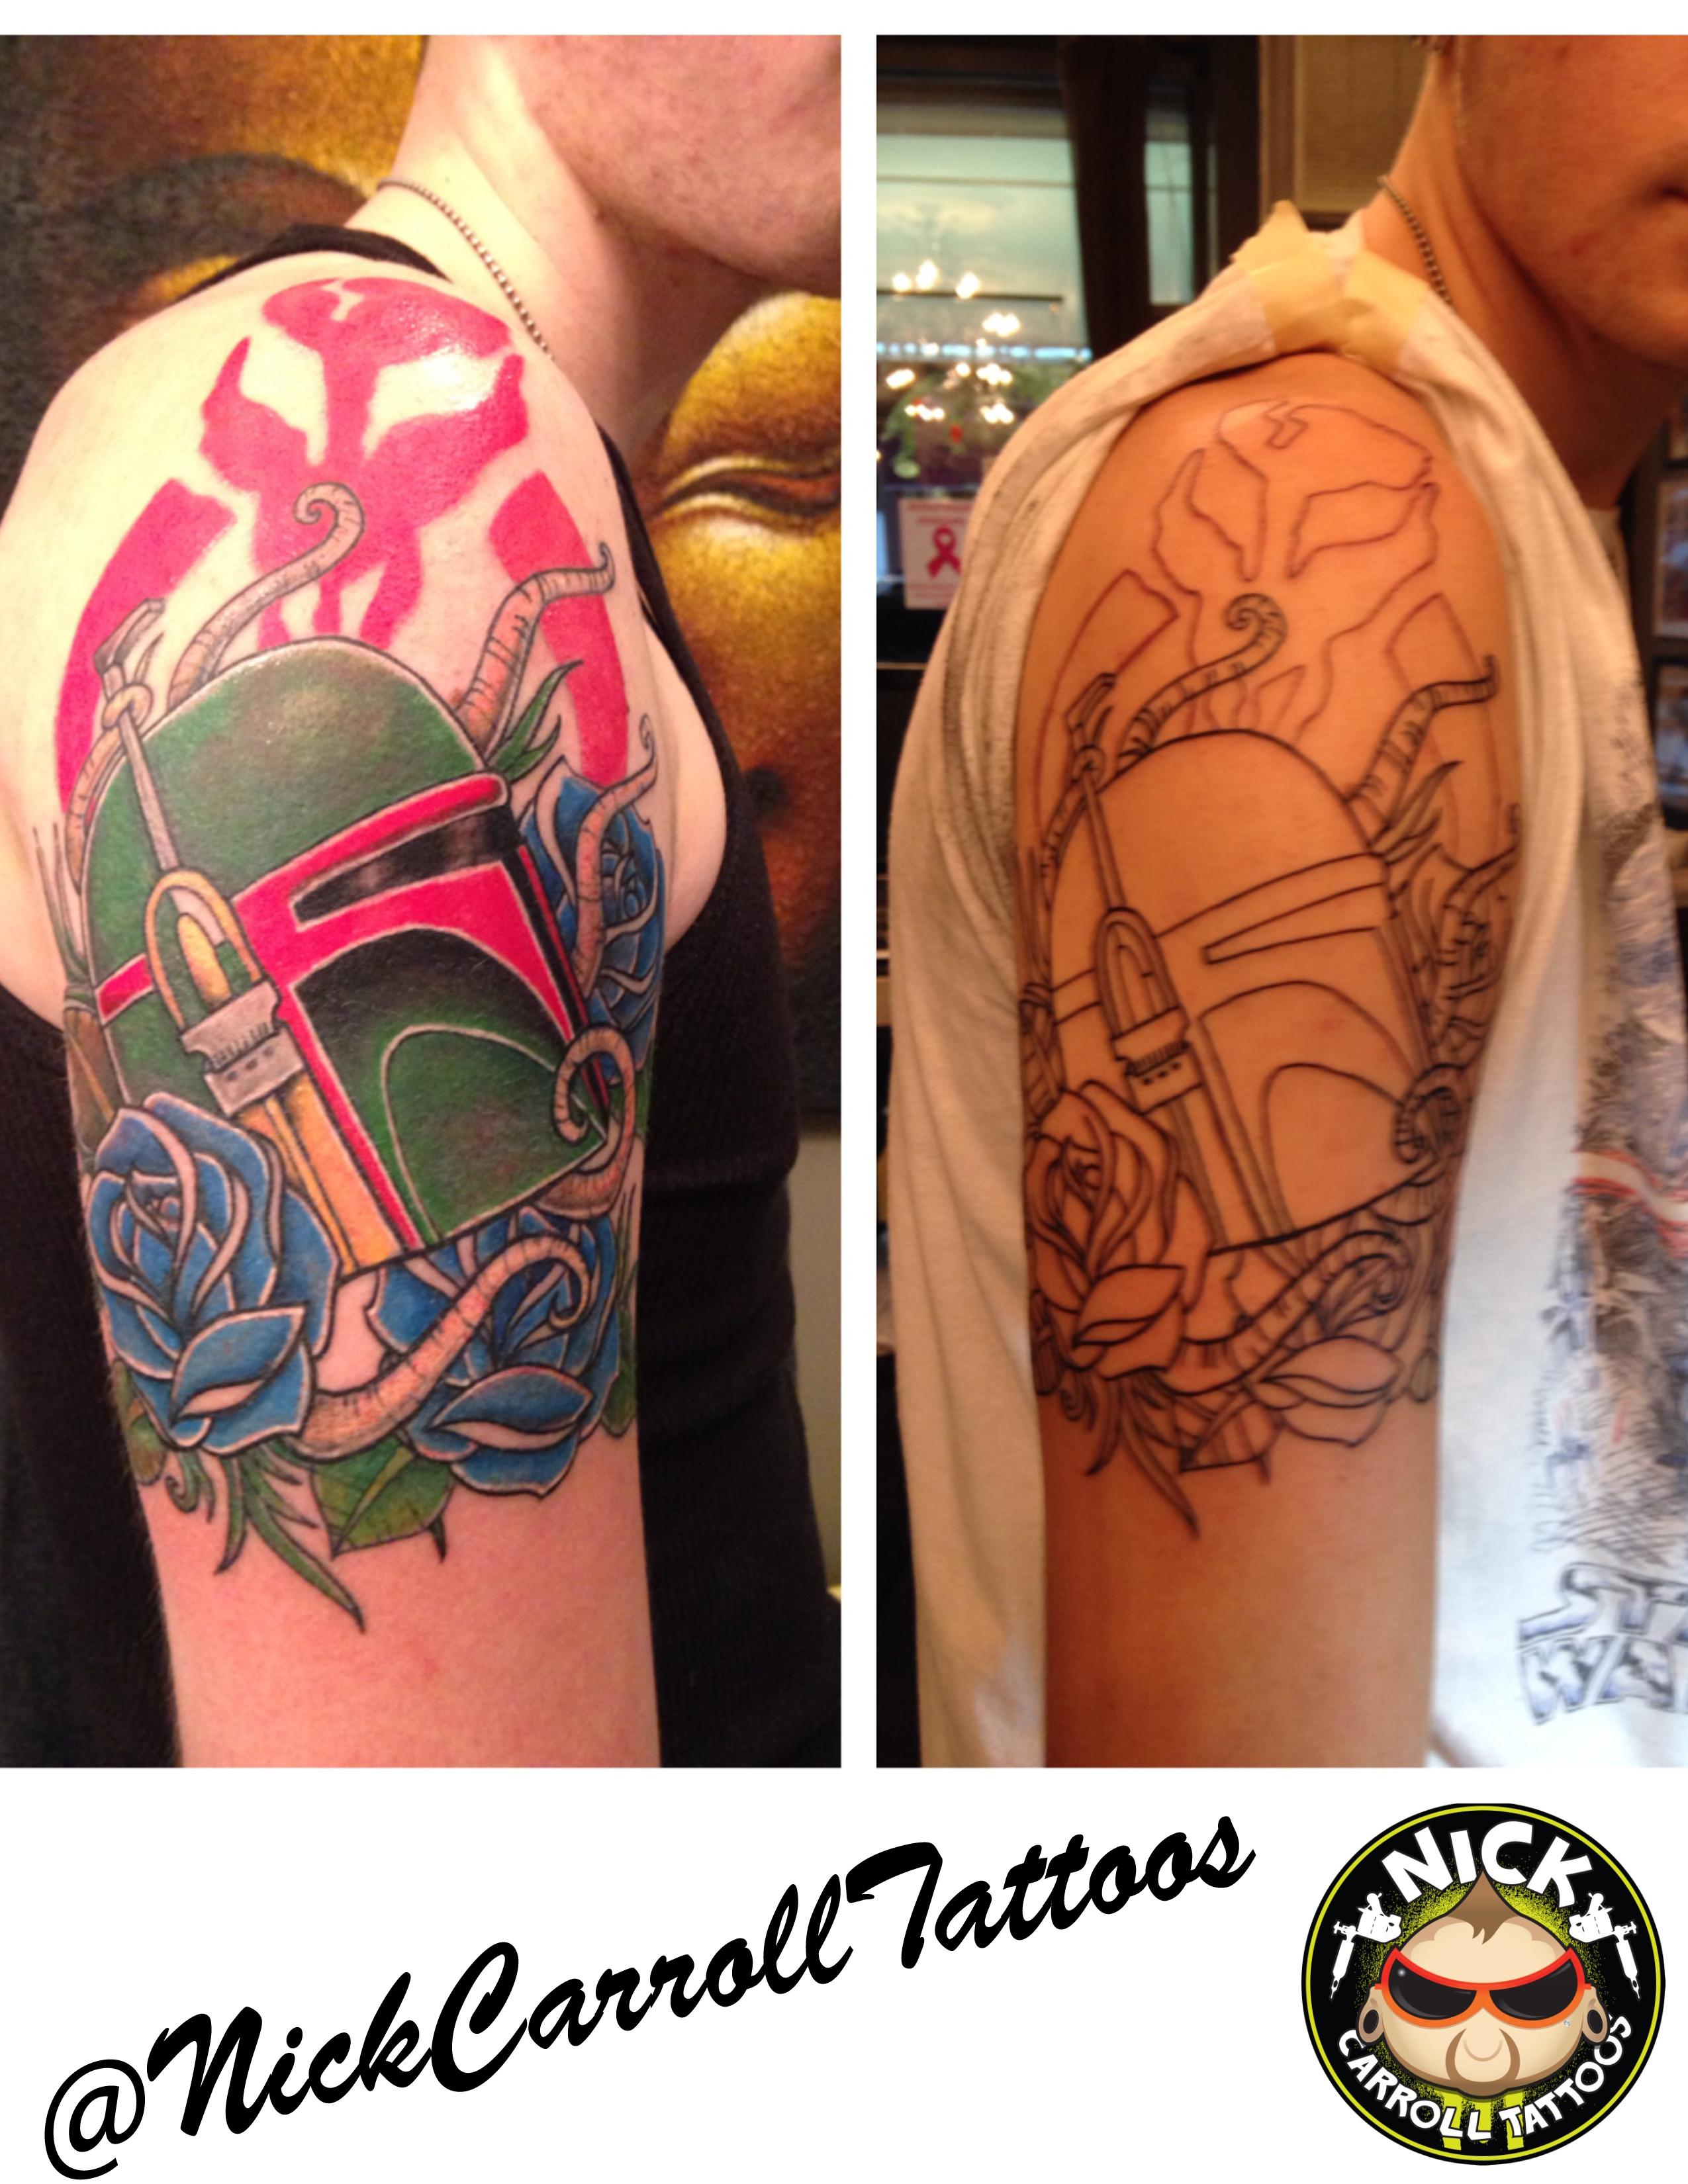 Boba Fett By Nick Carroll At Body Art And Soul Tattoos In Upper Darby Pa Nickcarroll509 Gmail Com Tattoo Com